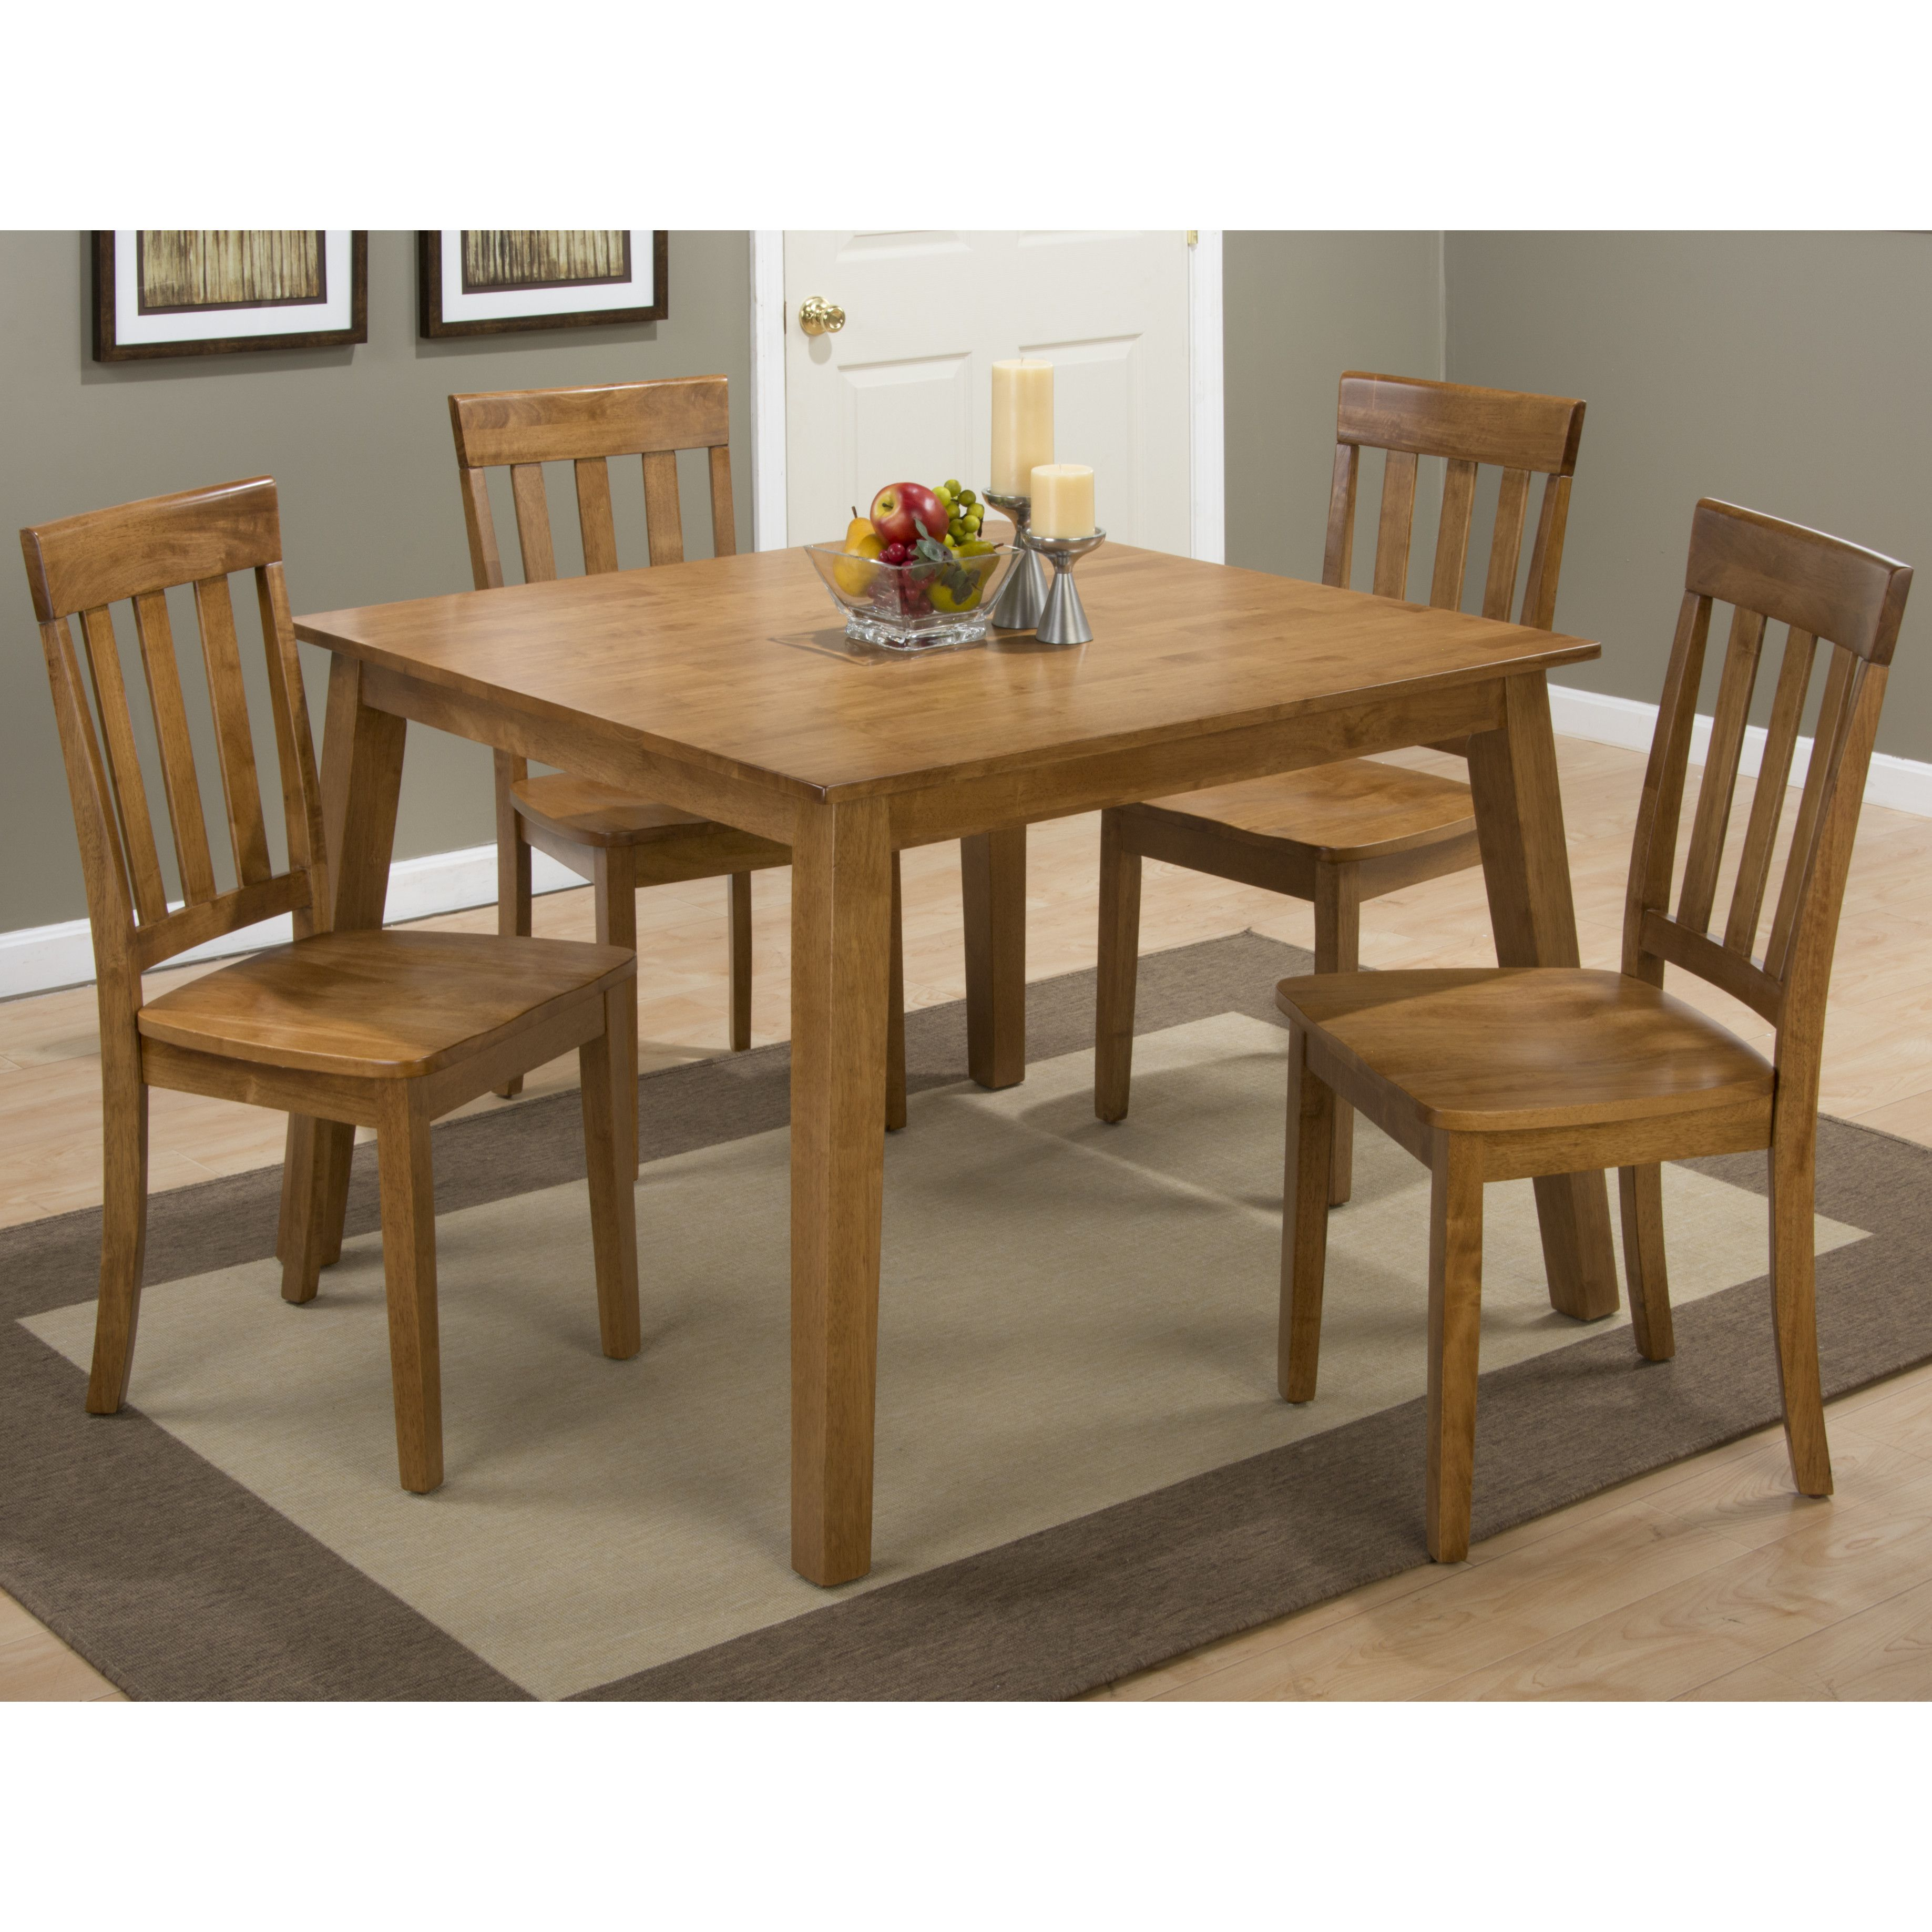 Alcott Hill® Antrim 5 Piece Dining Set